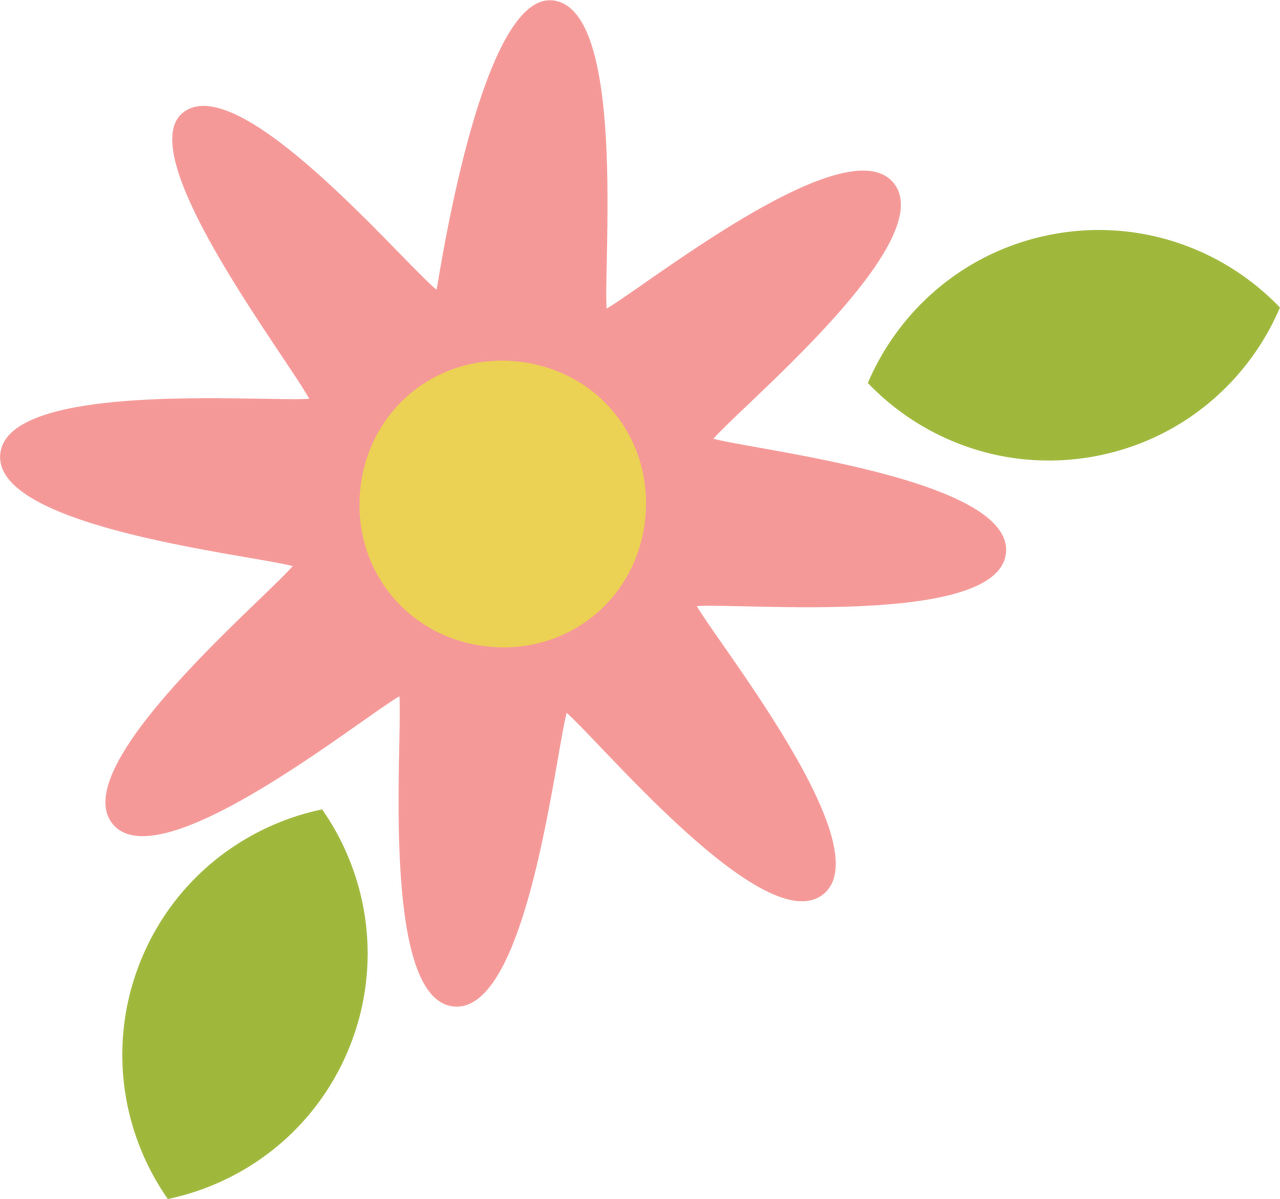 Flower #5 SVG Cut File